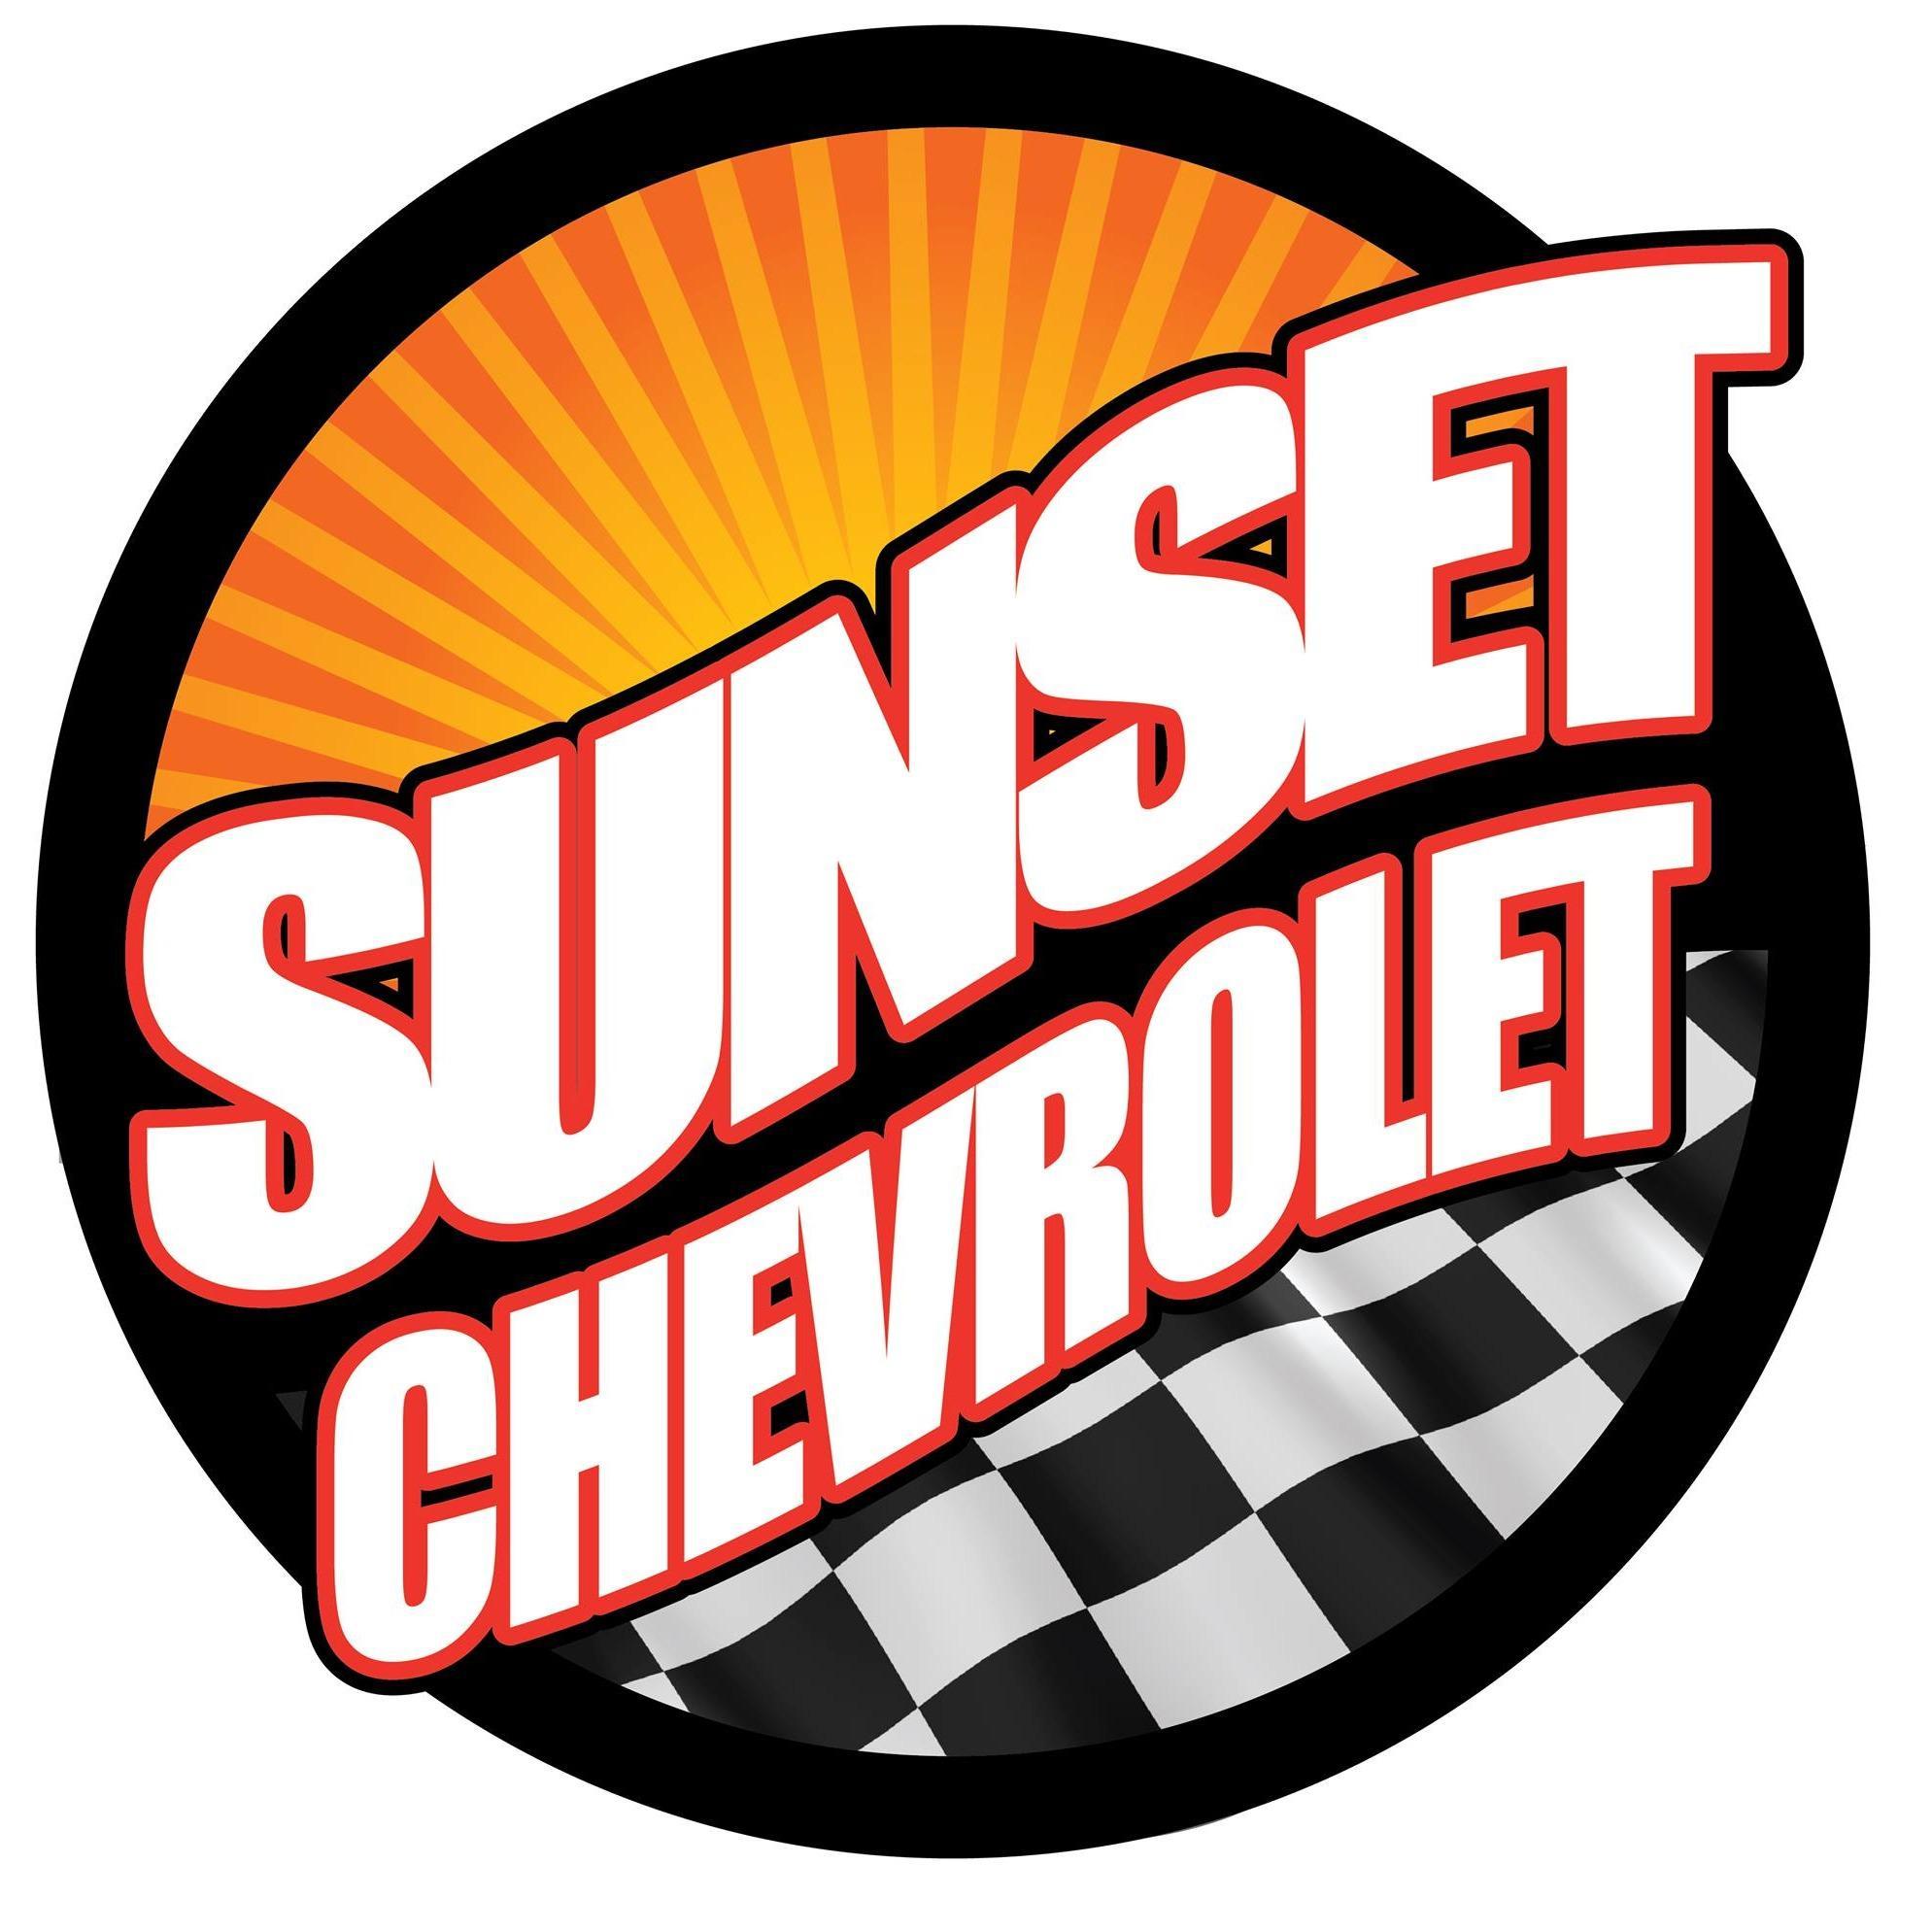 Sunset Chevrolet - Sumner, WA - Auto Dealers